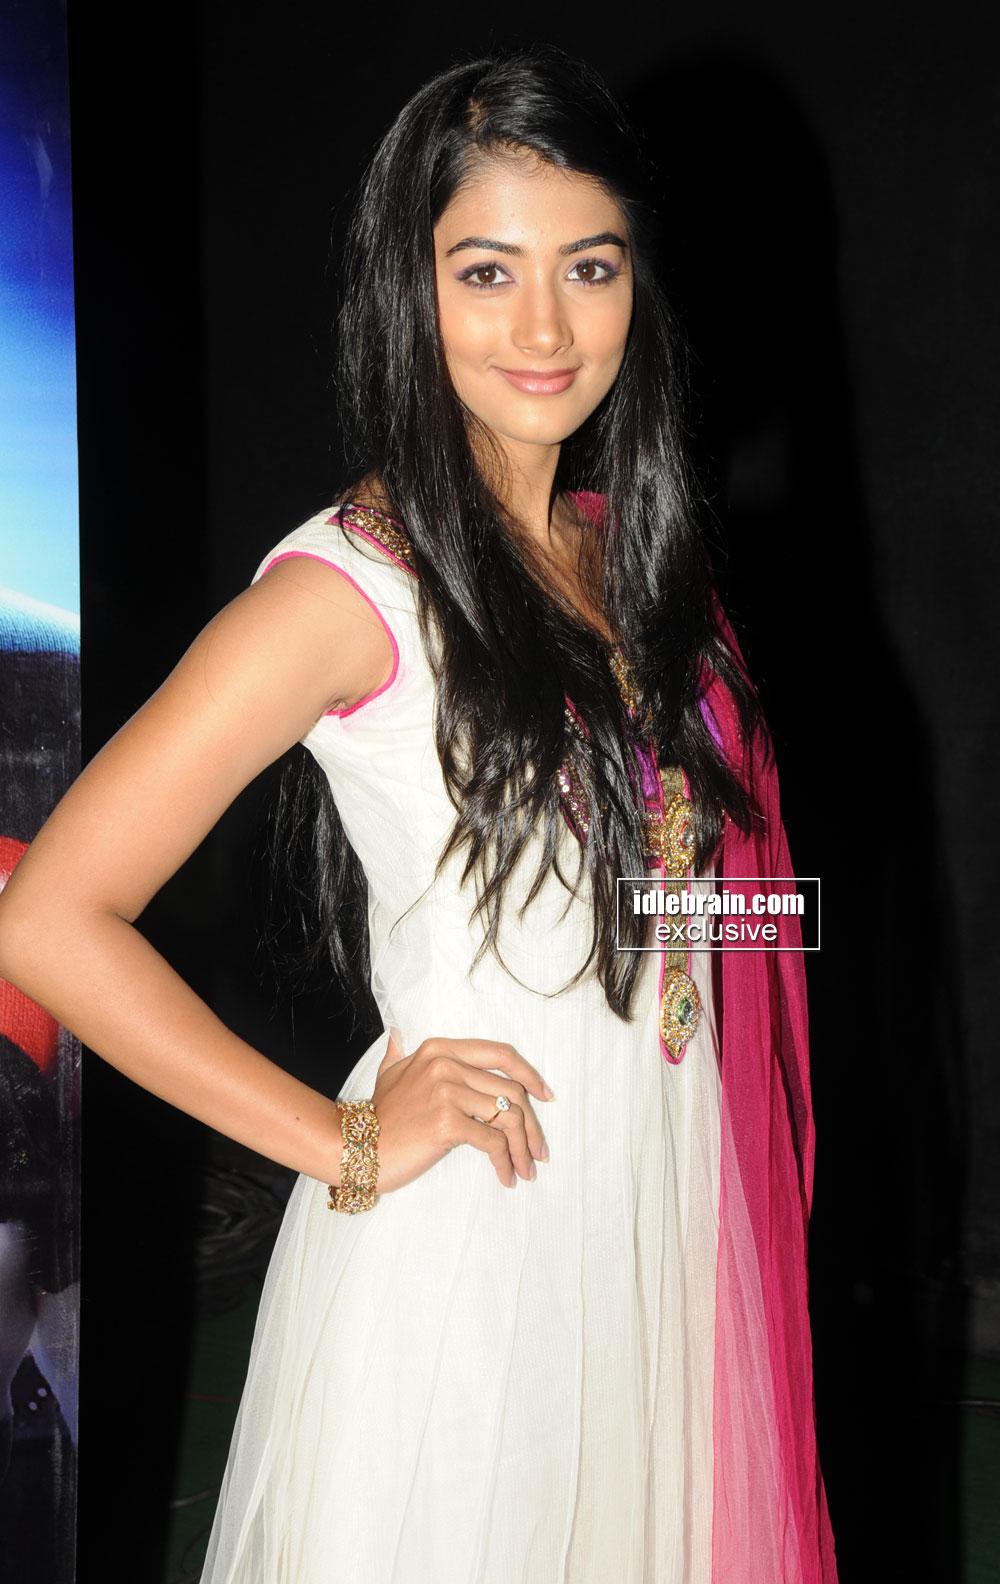 Pooja Hegde in white kurta